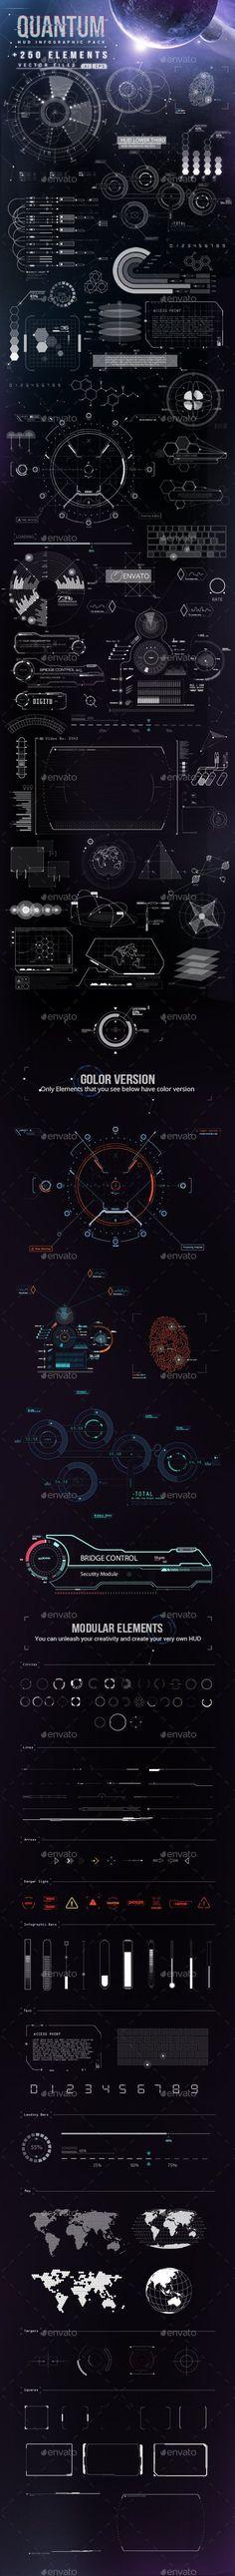 #VR #VRGames #Drone #Gaming Best 30 Infographics Template Designs 2015 - HowFreelance Designs, HowFreelance, infographics, Template, VR Pics #Designs #HowFreelance #Infographics #Template #VRPics https://datacracy.com/best-30-infographics-template-designs-2015-howfreelance-3/